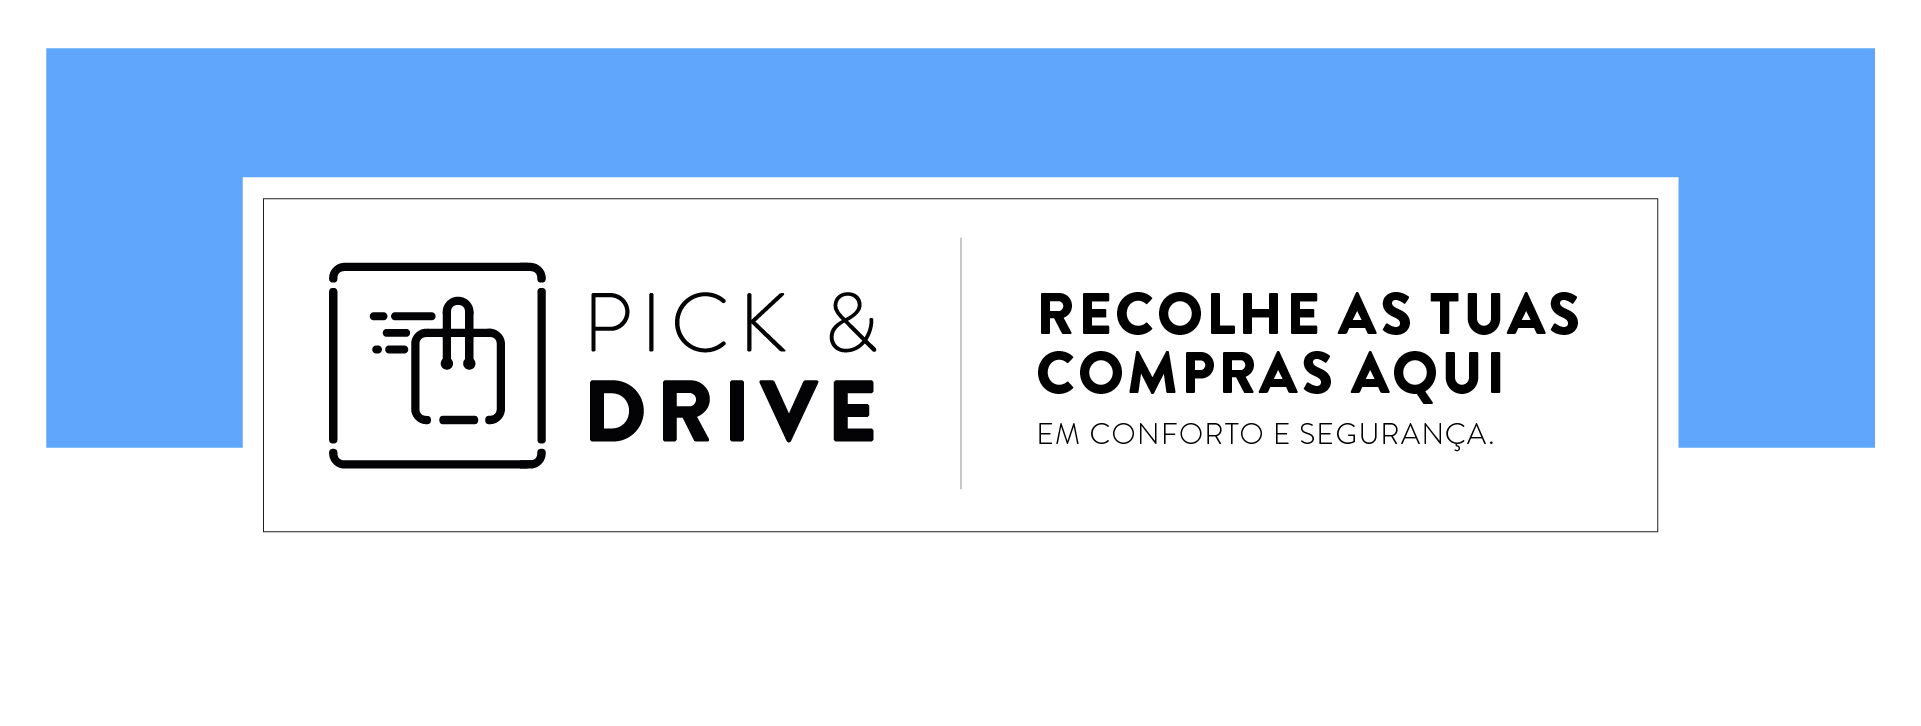 Nosso Shopping   Pick & Drive